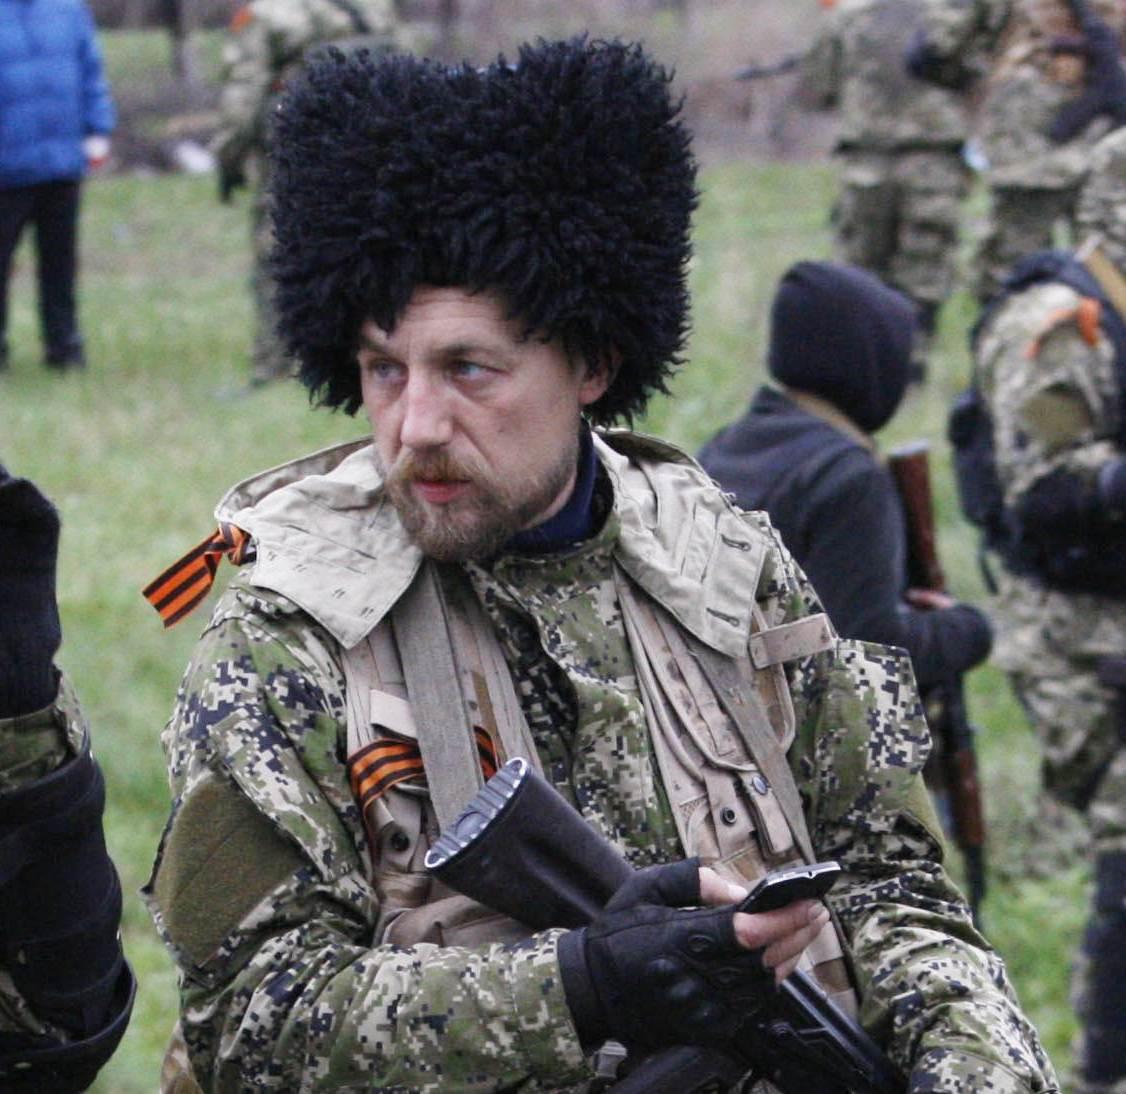 Семи дней мира на Донбассе недостаточно, - Путин - Цензор.НЕТ 3163